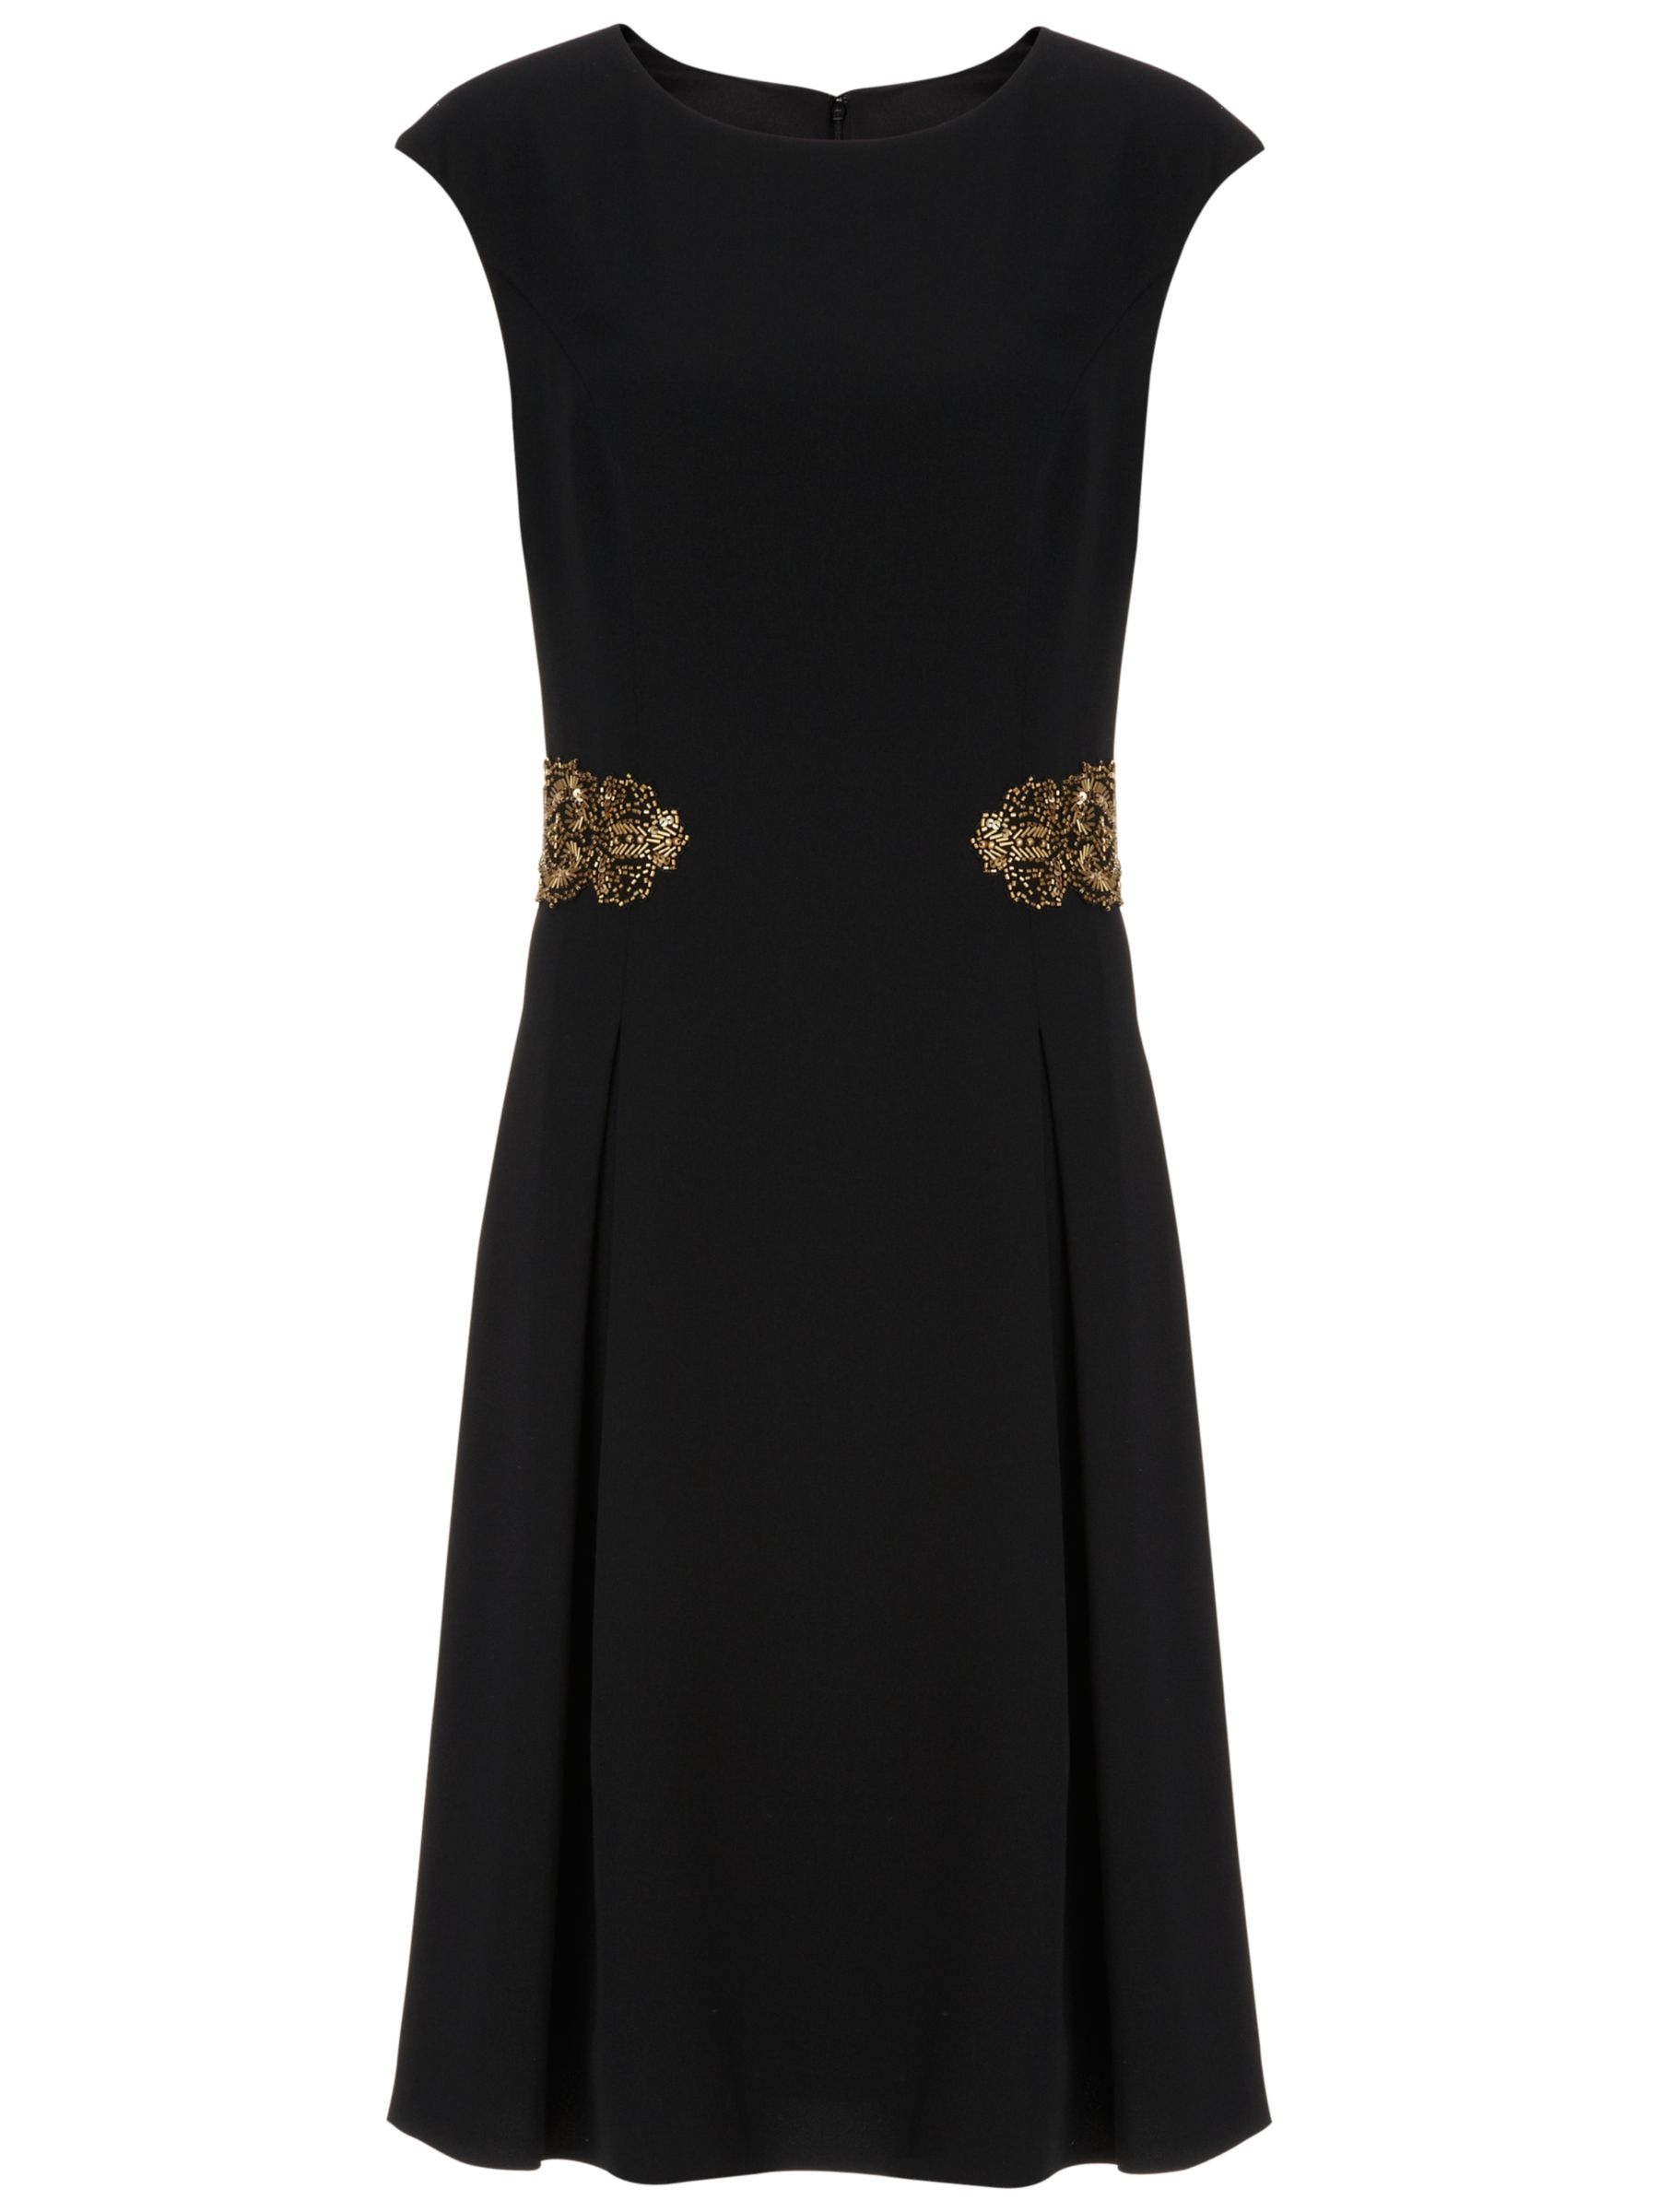 Gina Bacconi Moss Crepe Dress, Black